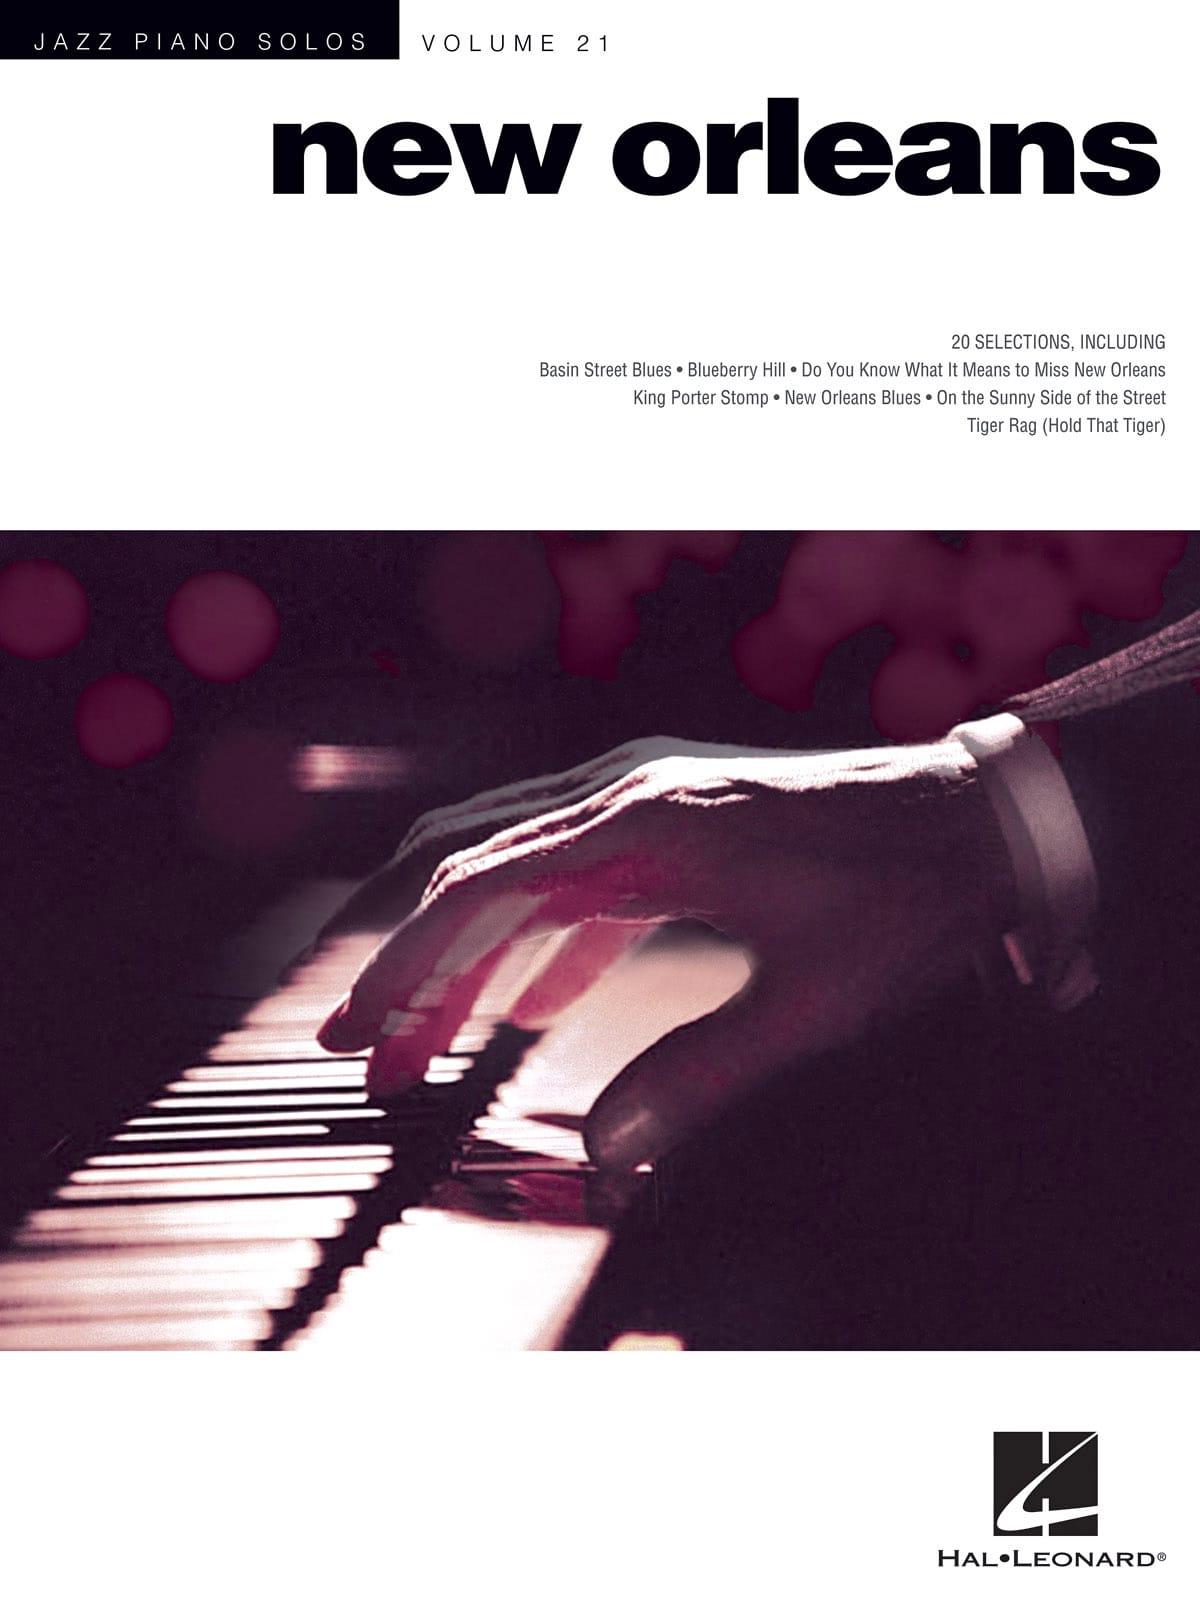 Jazz piano solos volume 21 - New Orleans - laflutedepan.com